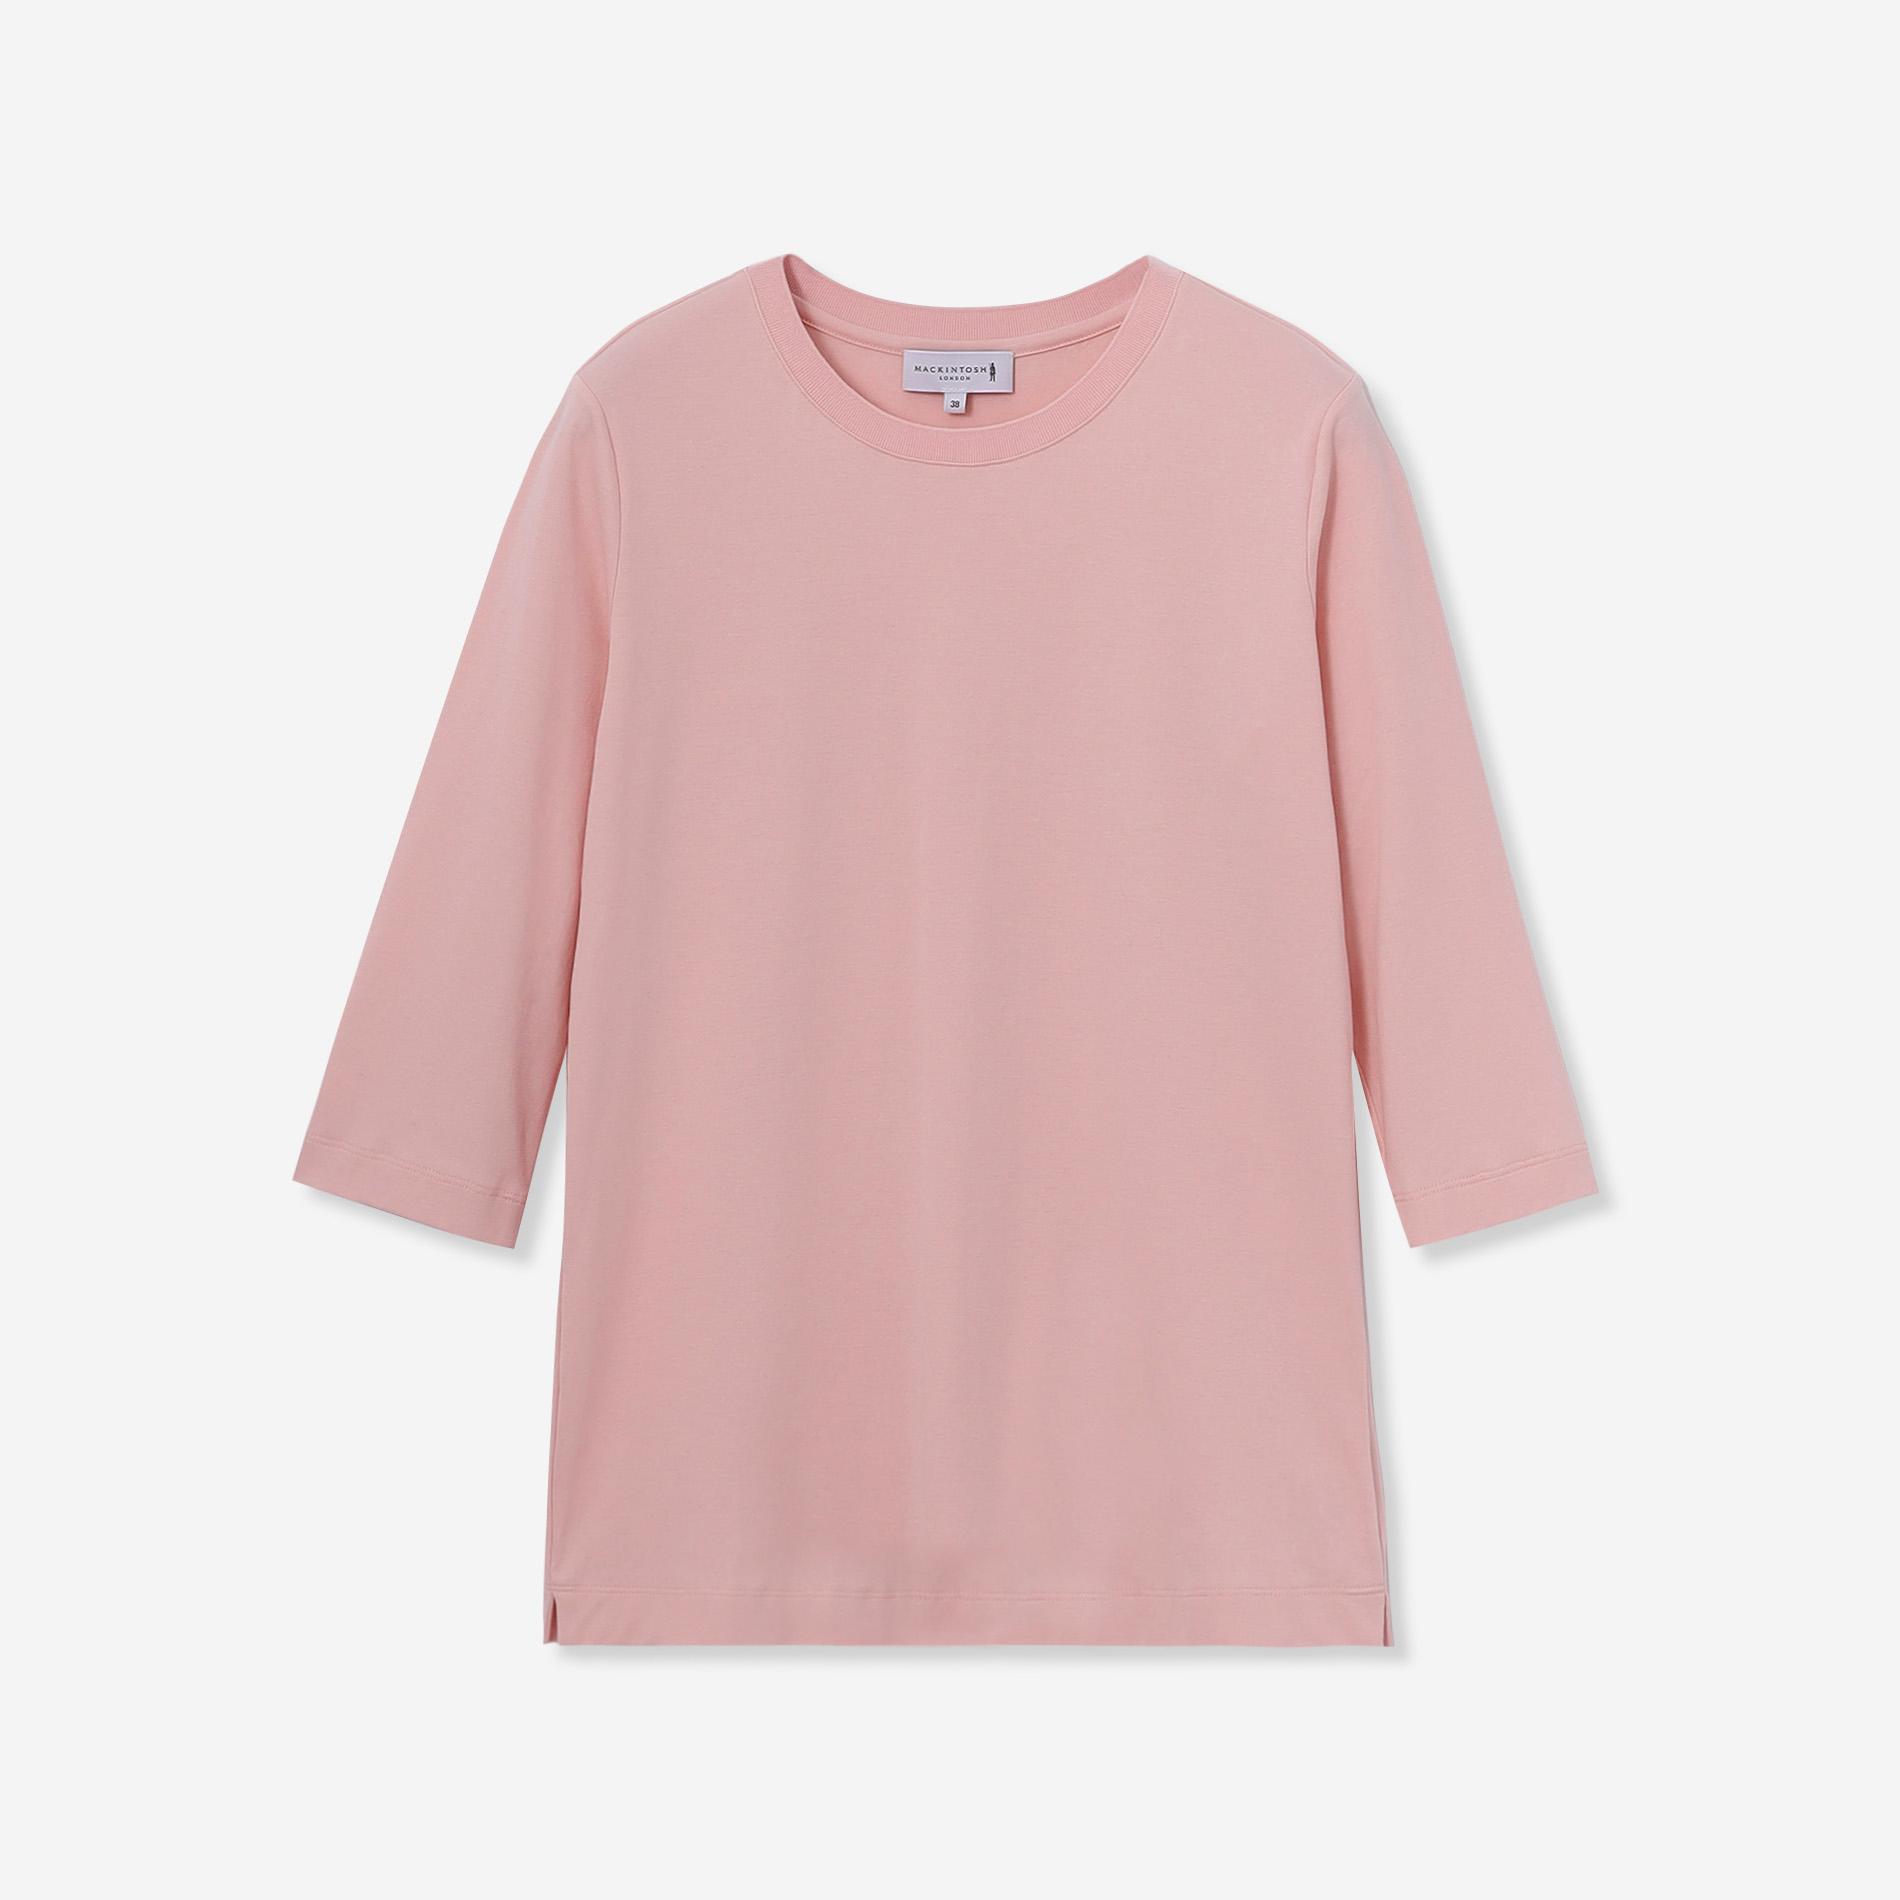 ◆◆【SUPER FINE LAB.】パウダーシュガーコットン五分袖Tシャツ